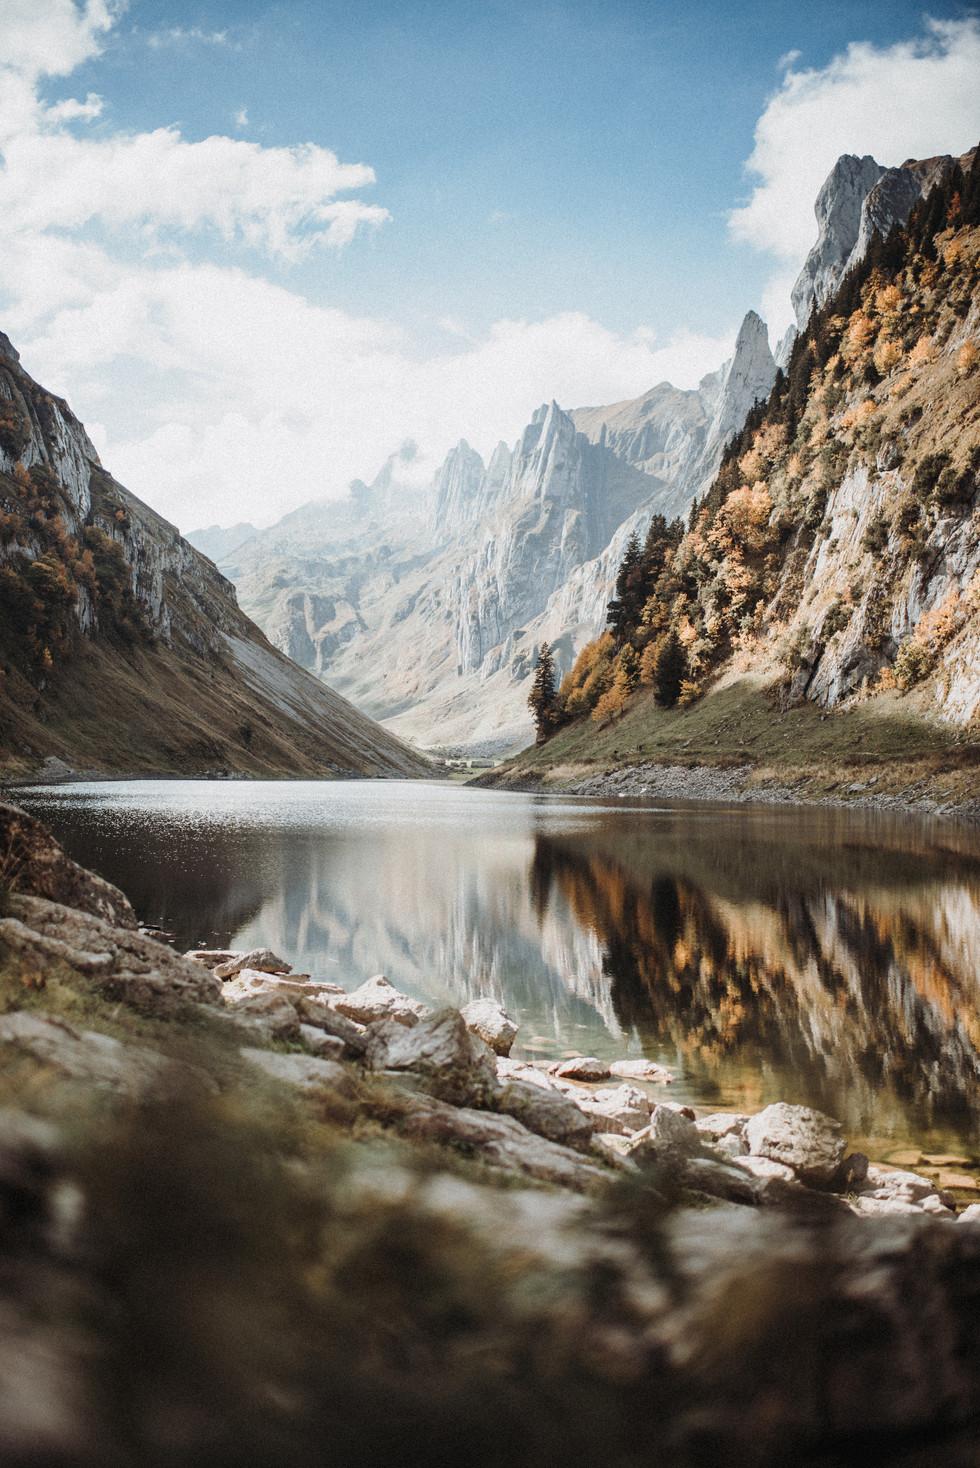 Wanderung Alpstein, Jan Keller Photography